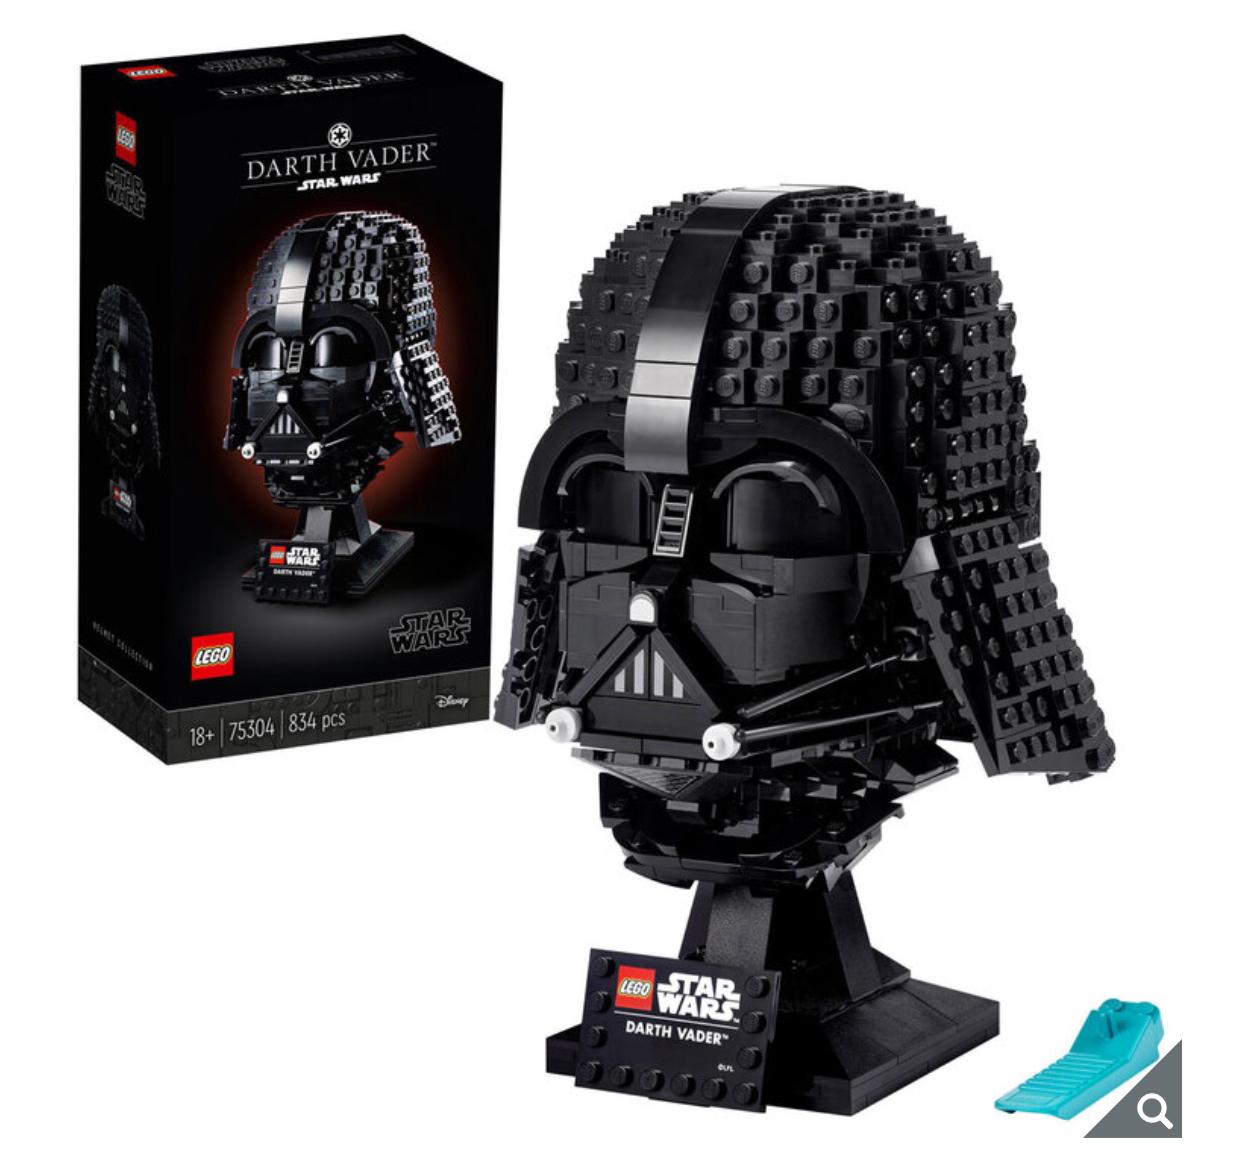 LEGO Star Wars 75304 Darth Vader™ Helmet at Costco (Membership Required) - £43.99